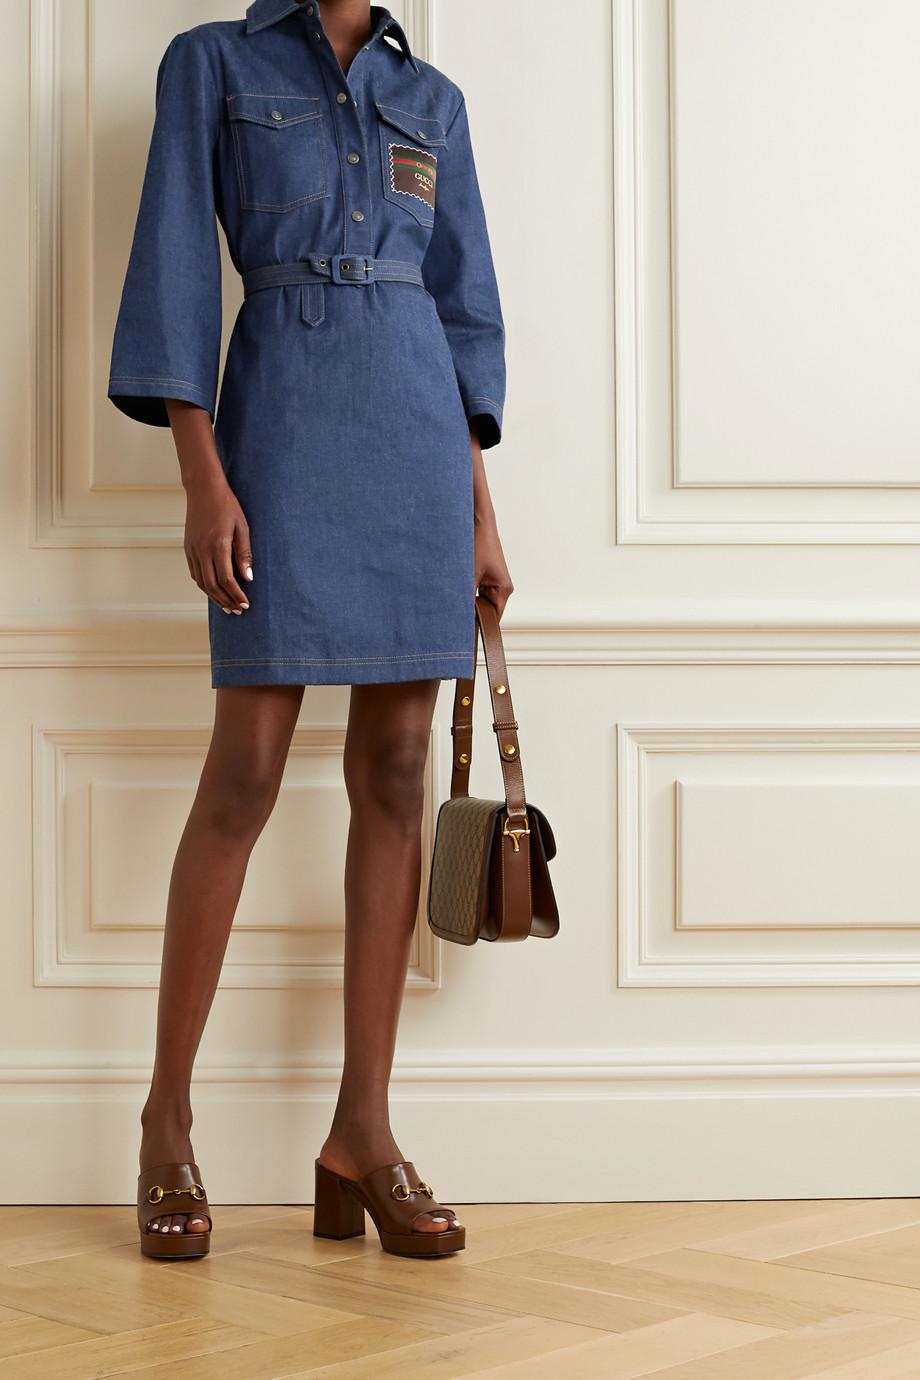 Gucci Belted appliquéd denim dress